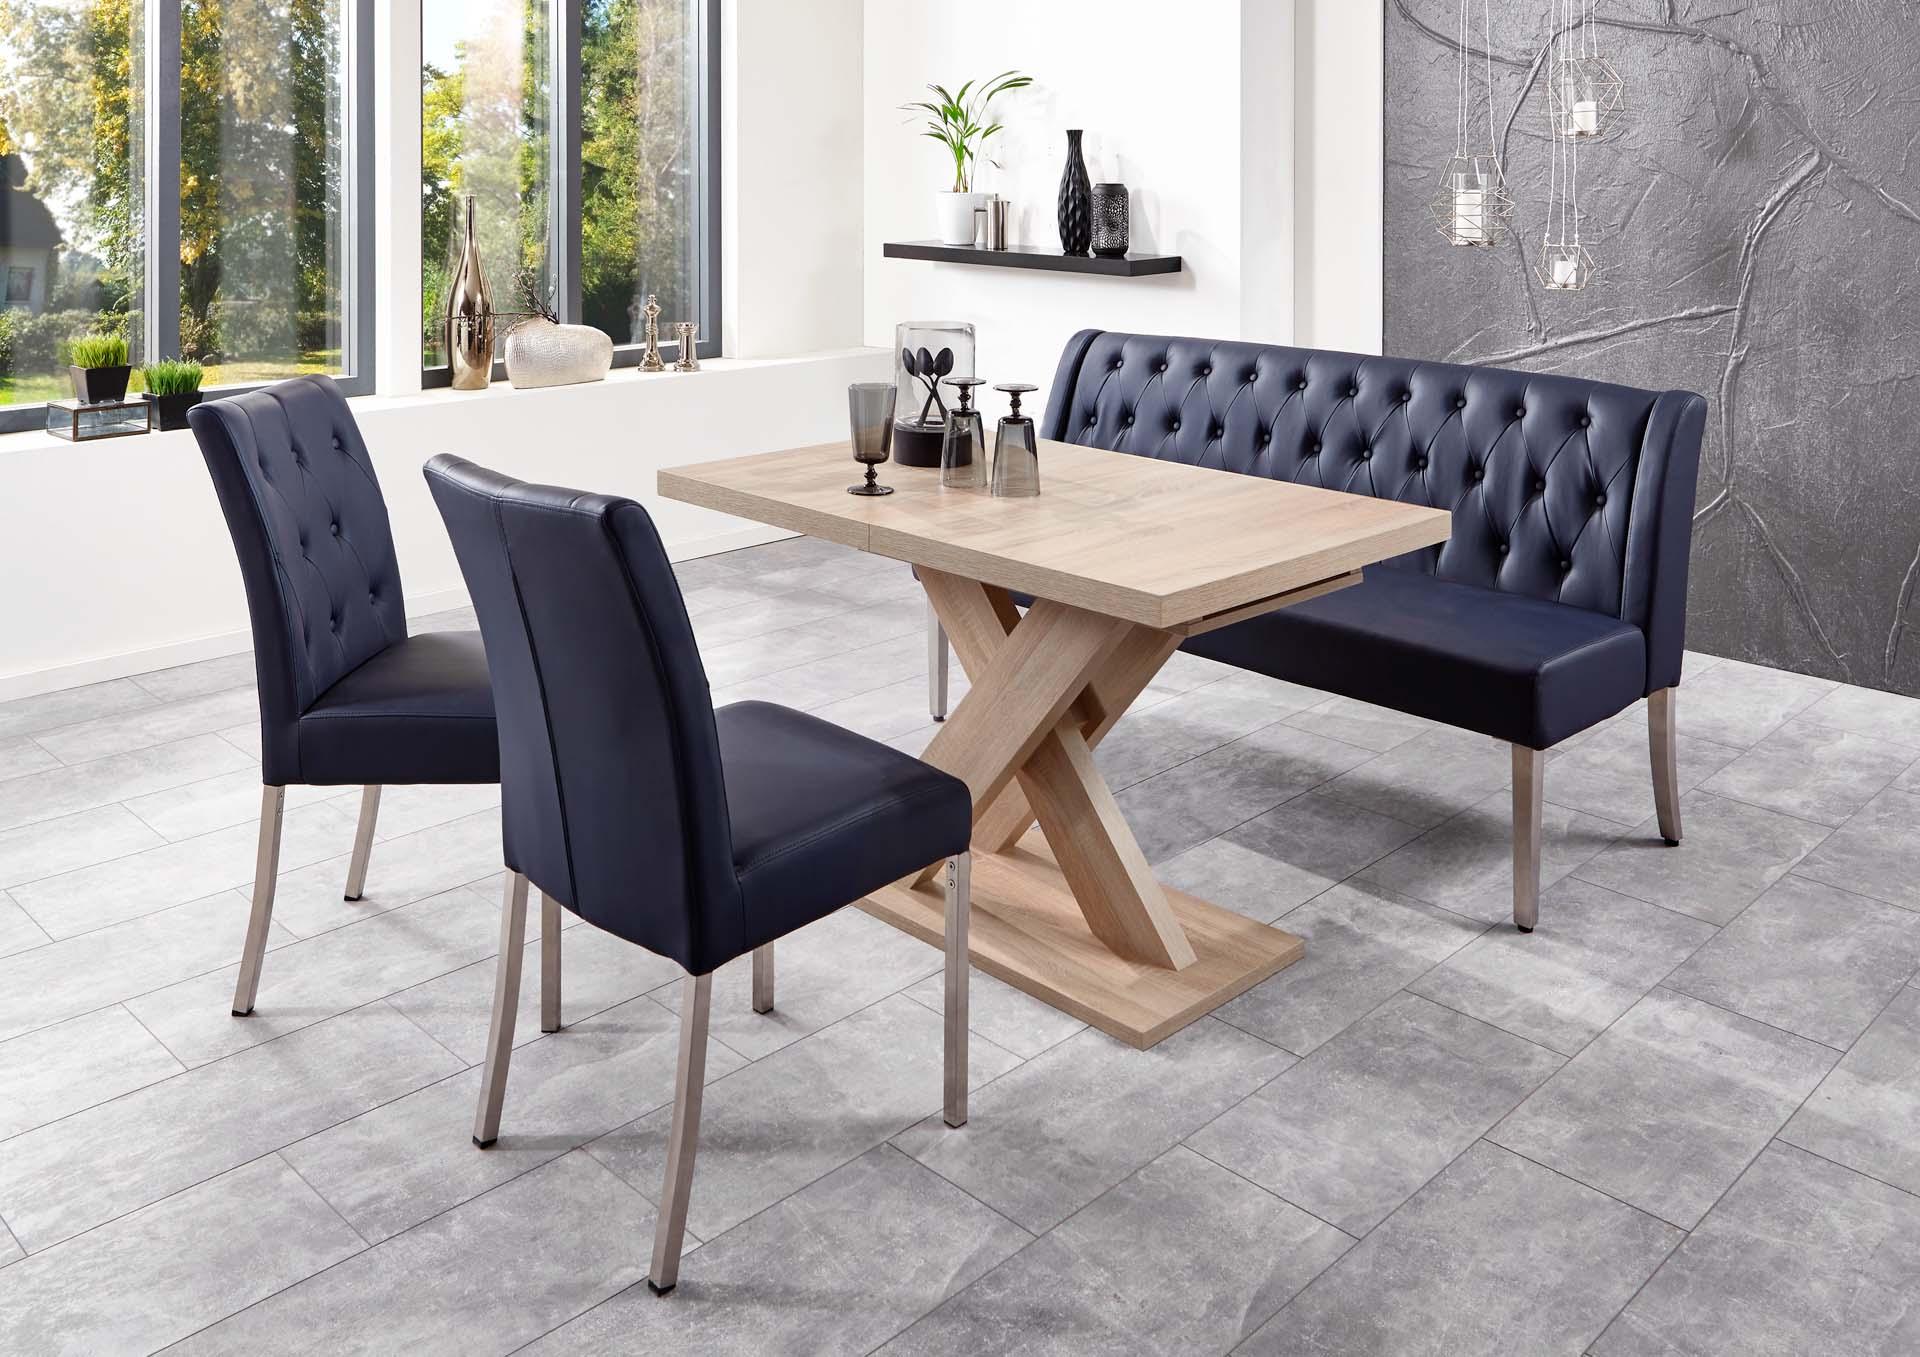 essgruppe bankgruppe manchester dunkelblau tisch sonoma eiche. Black Bedroom Furniture Sets. Home Design Ideas